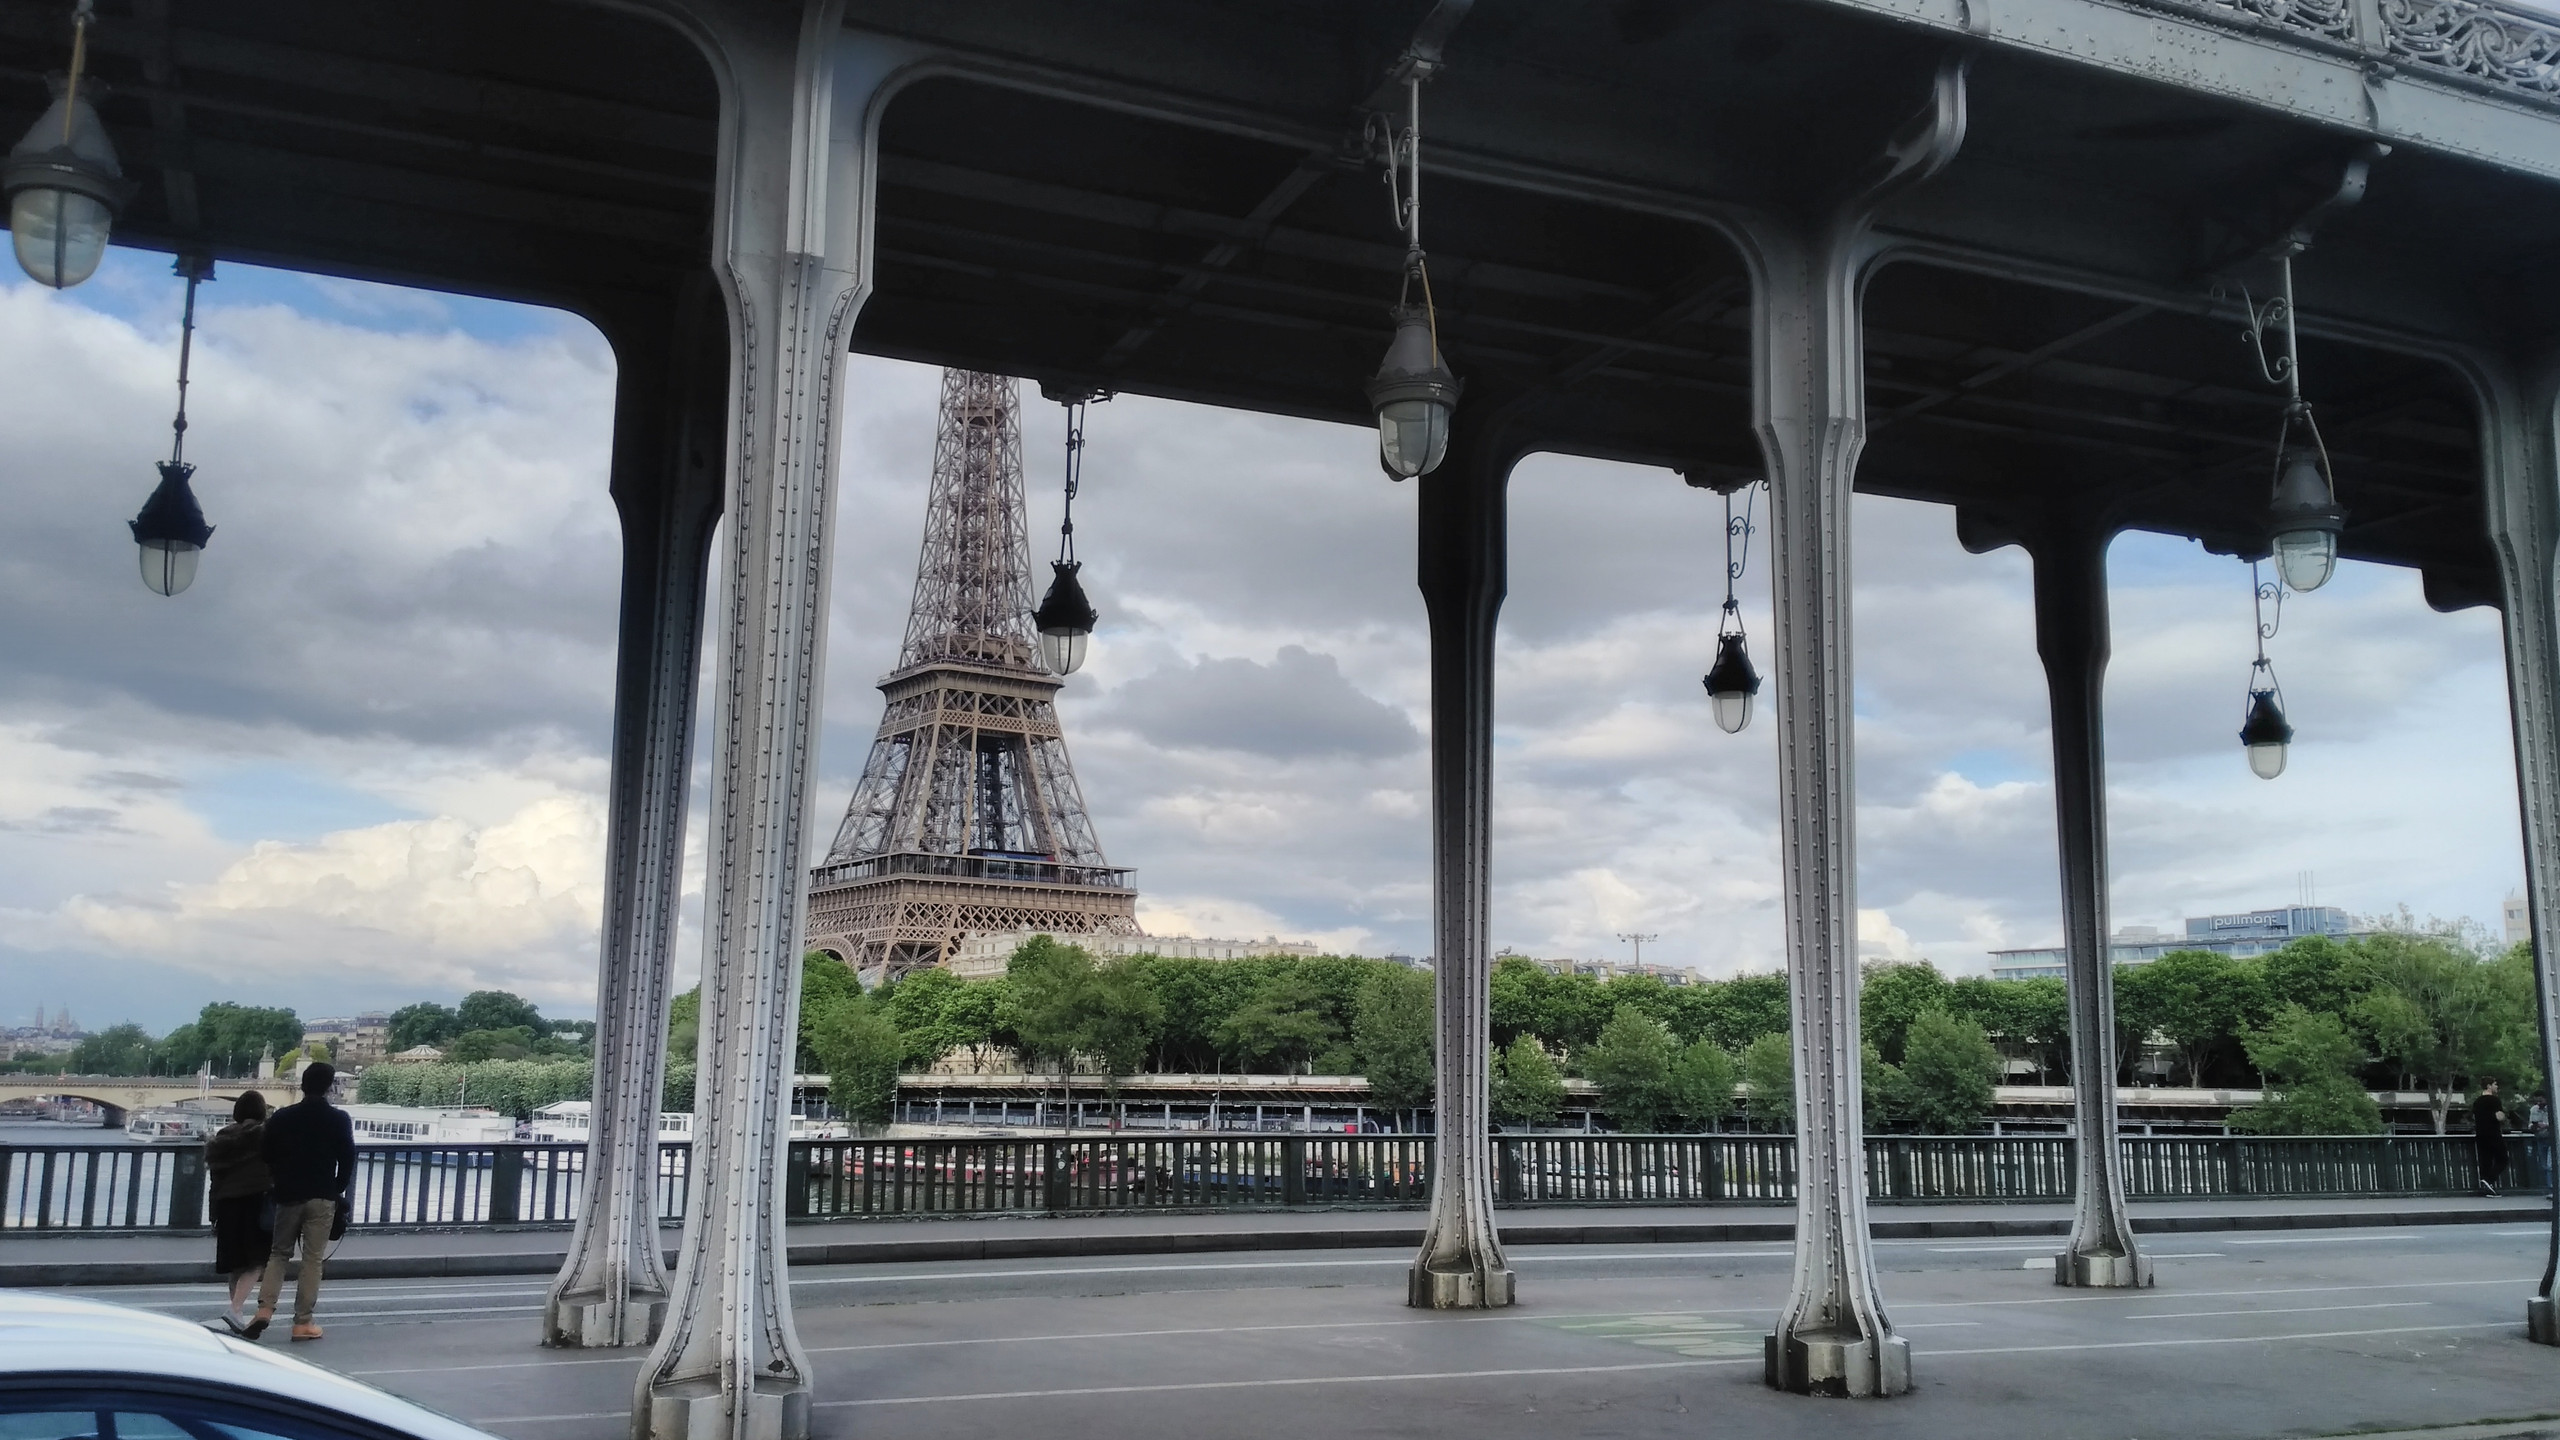 Eiffel Tower-Pont de Bir Hakheim